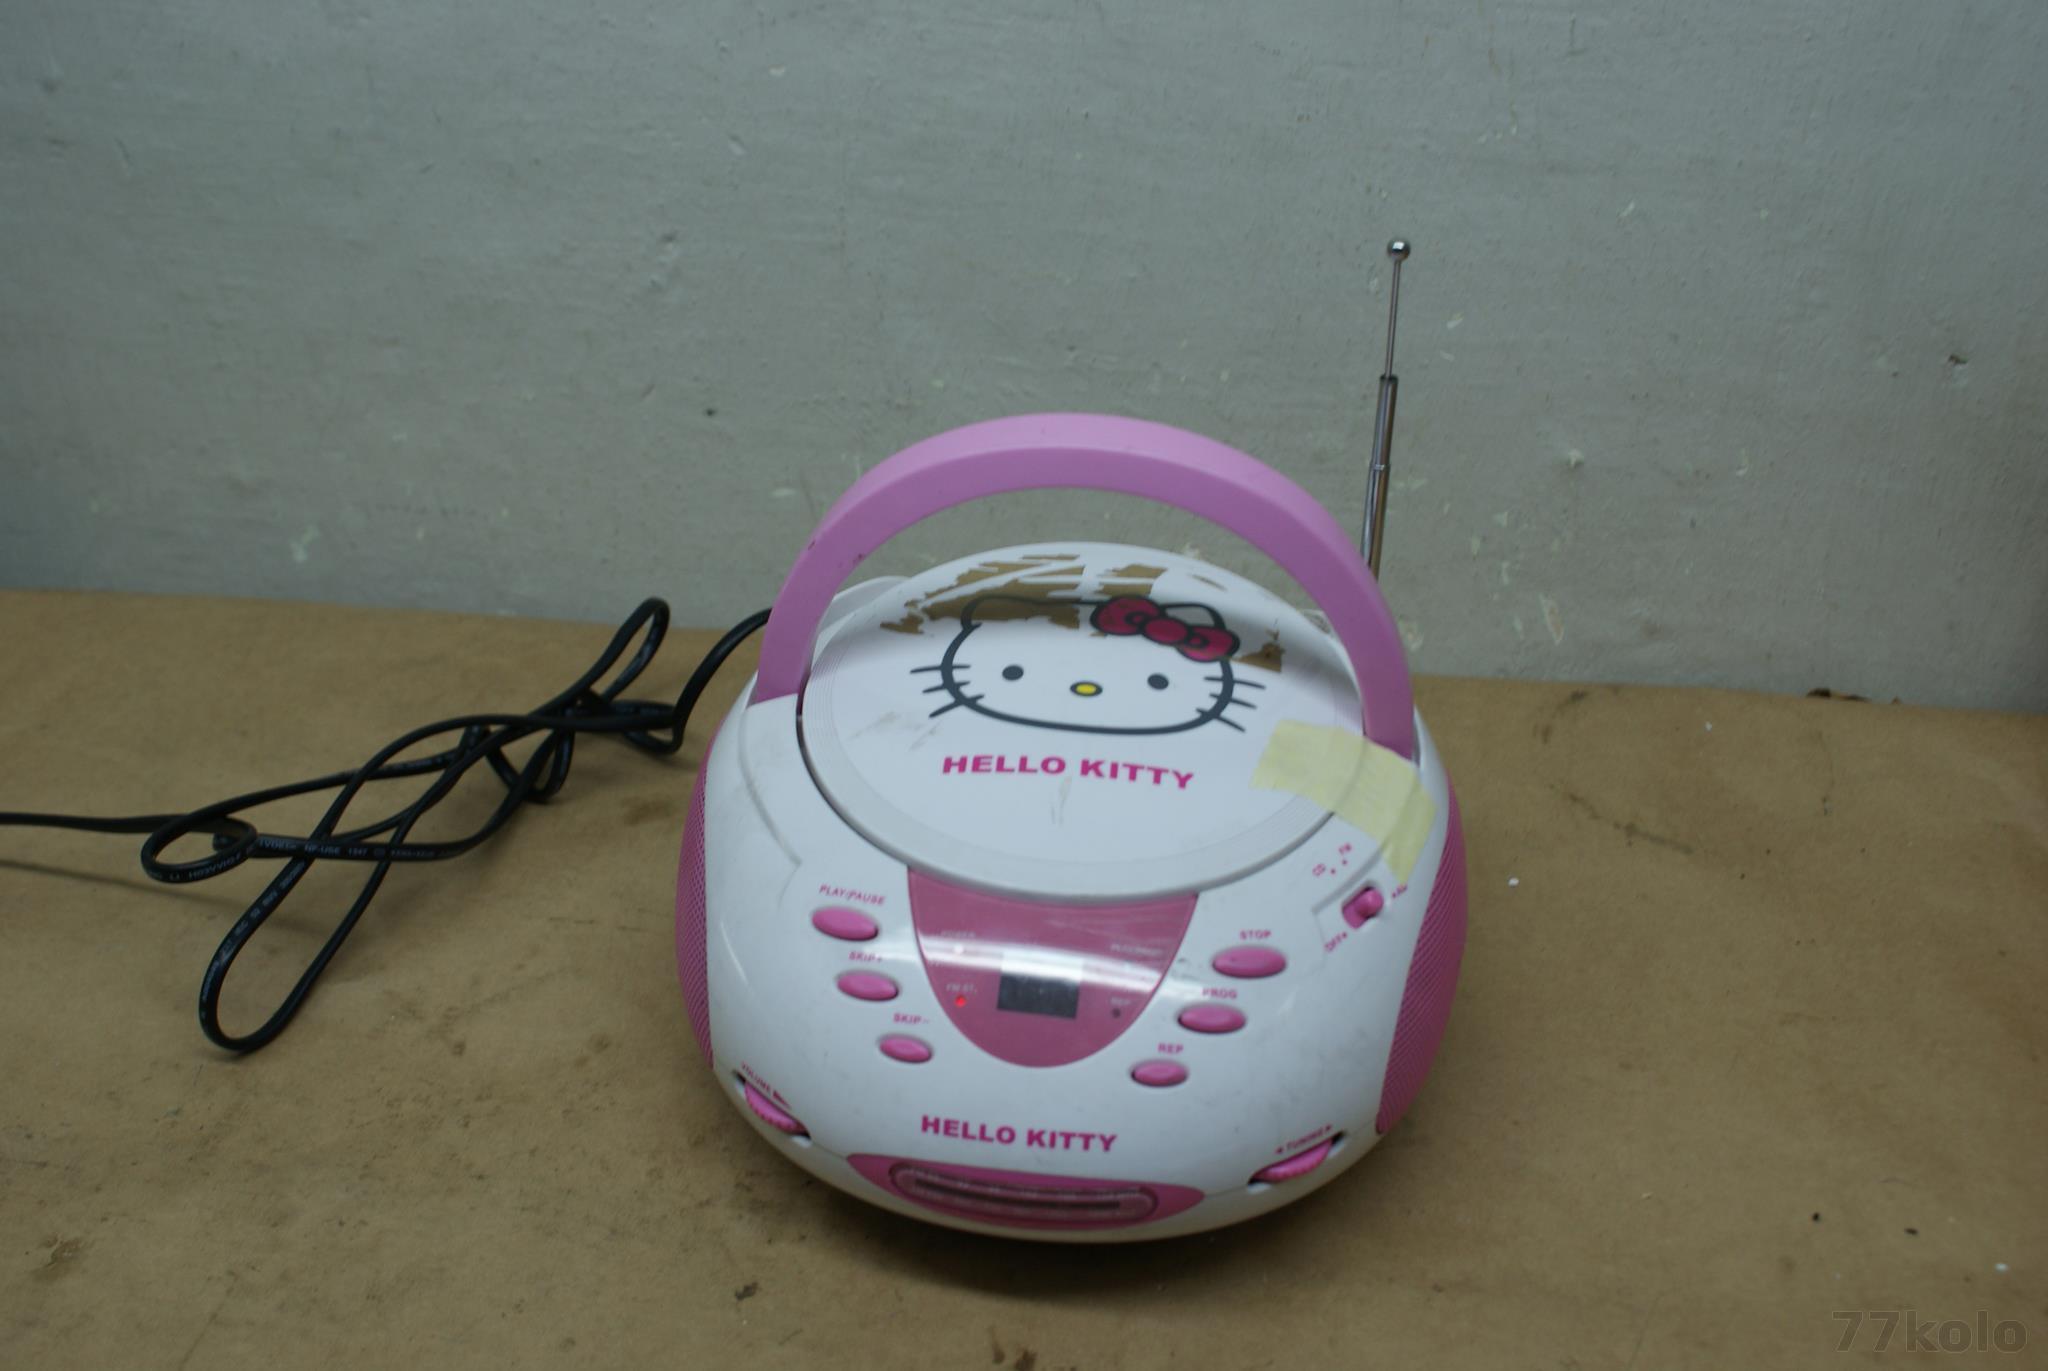 HELLO KITTY RADIOODTWARZACZ CD BOOMBOX (4414)